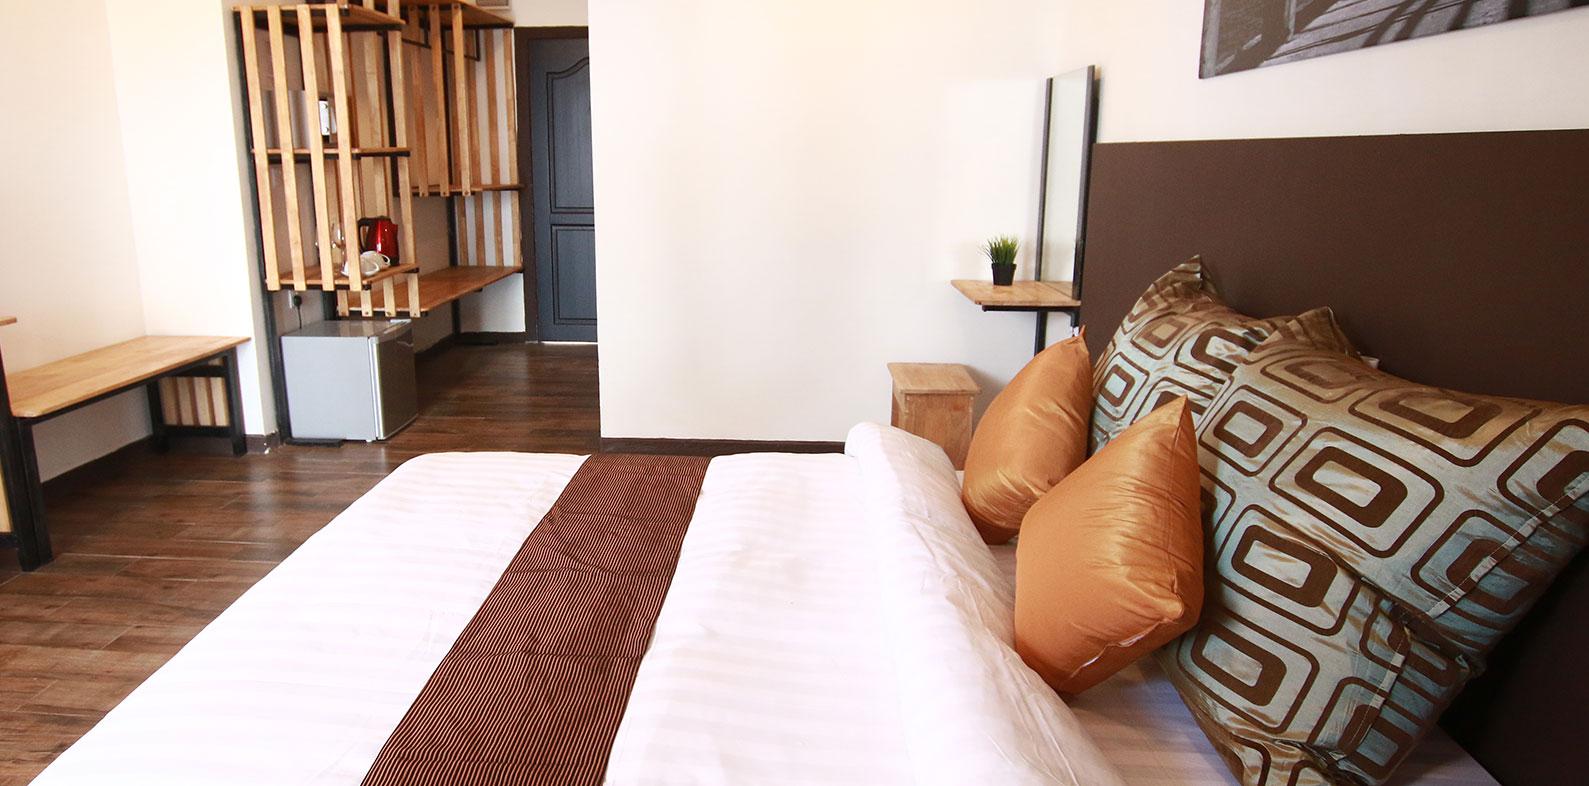 Barat Tioman Beach Resort  U2013 A Journey Of Discovery